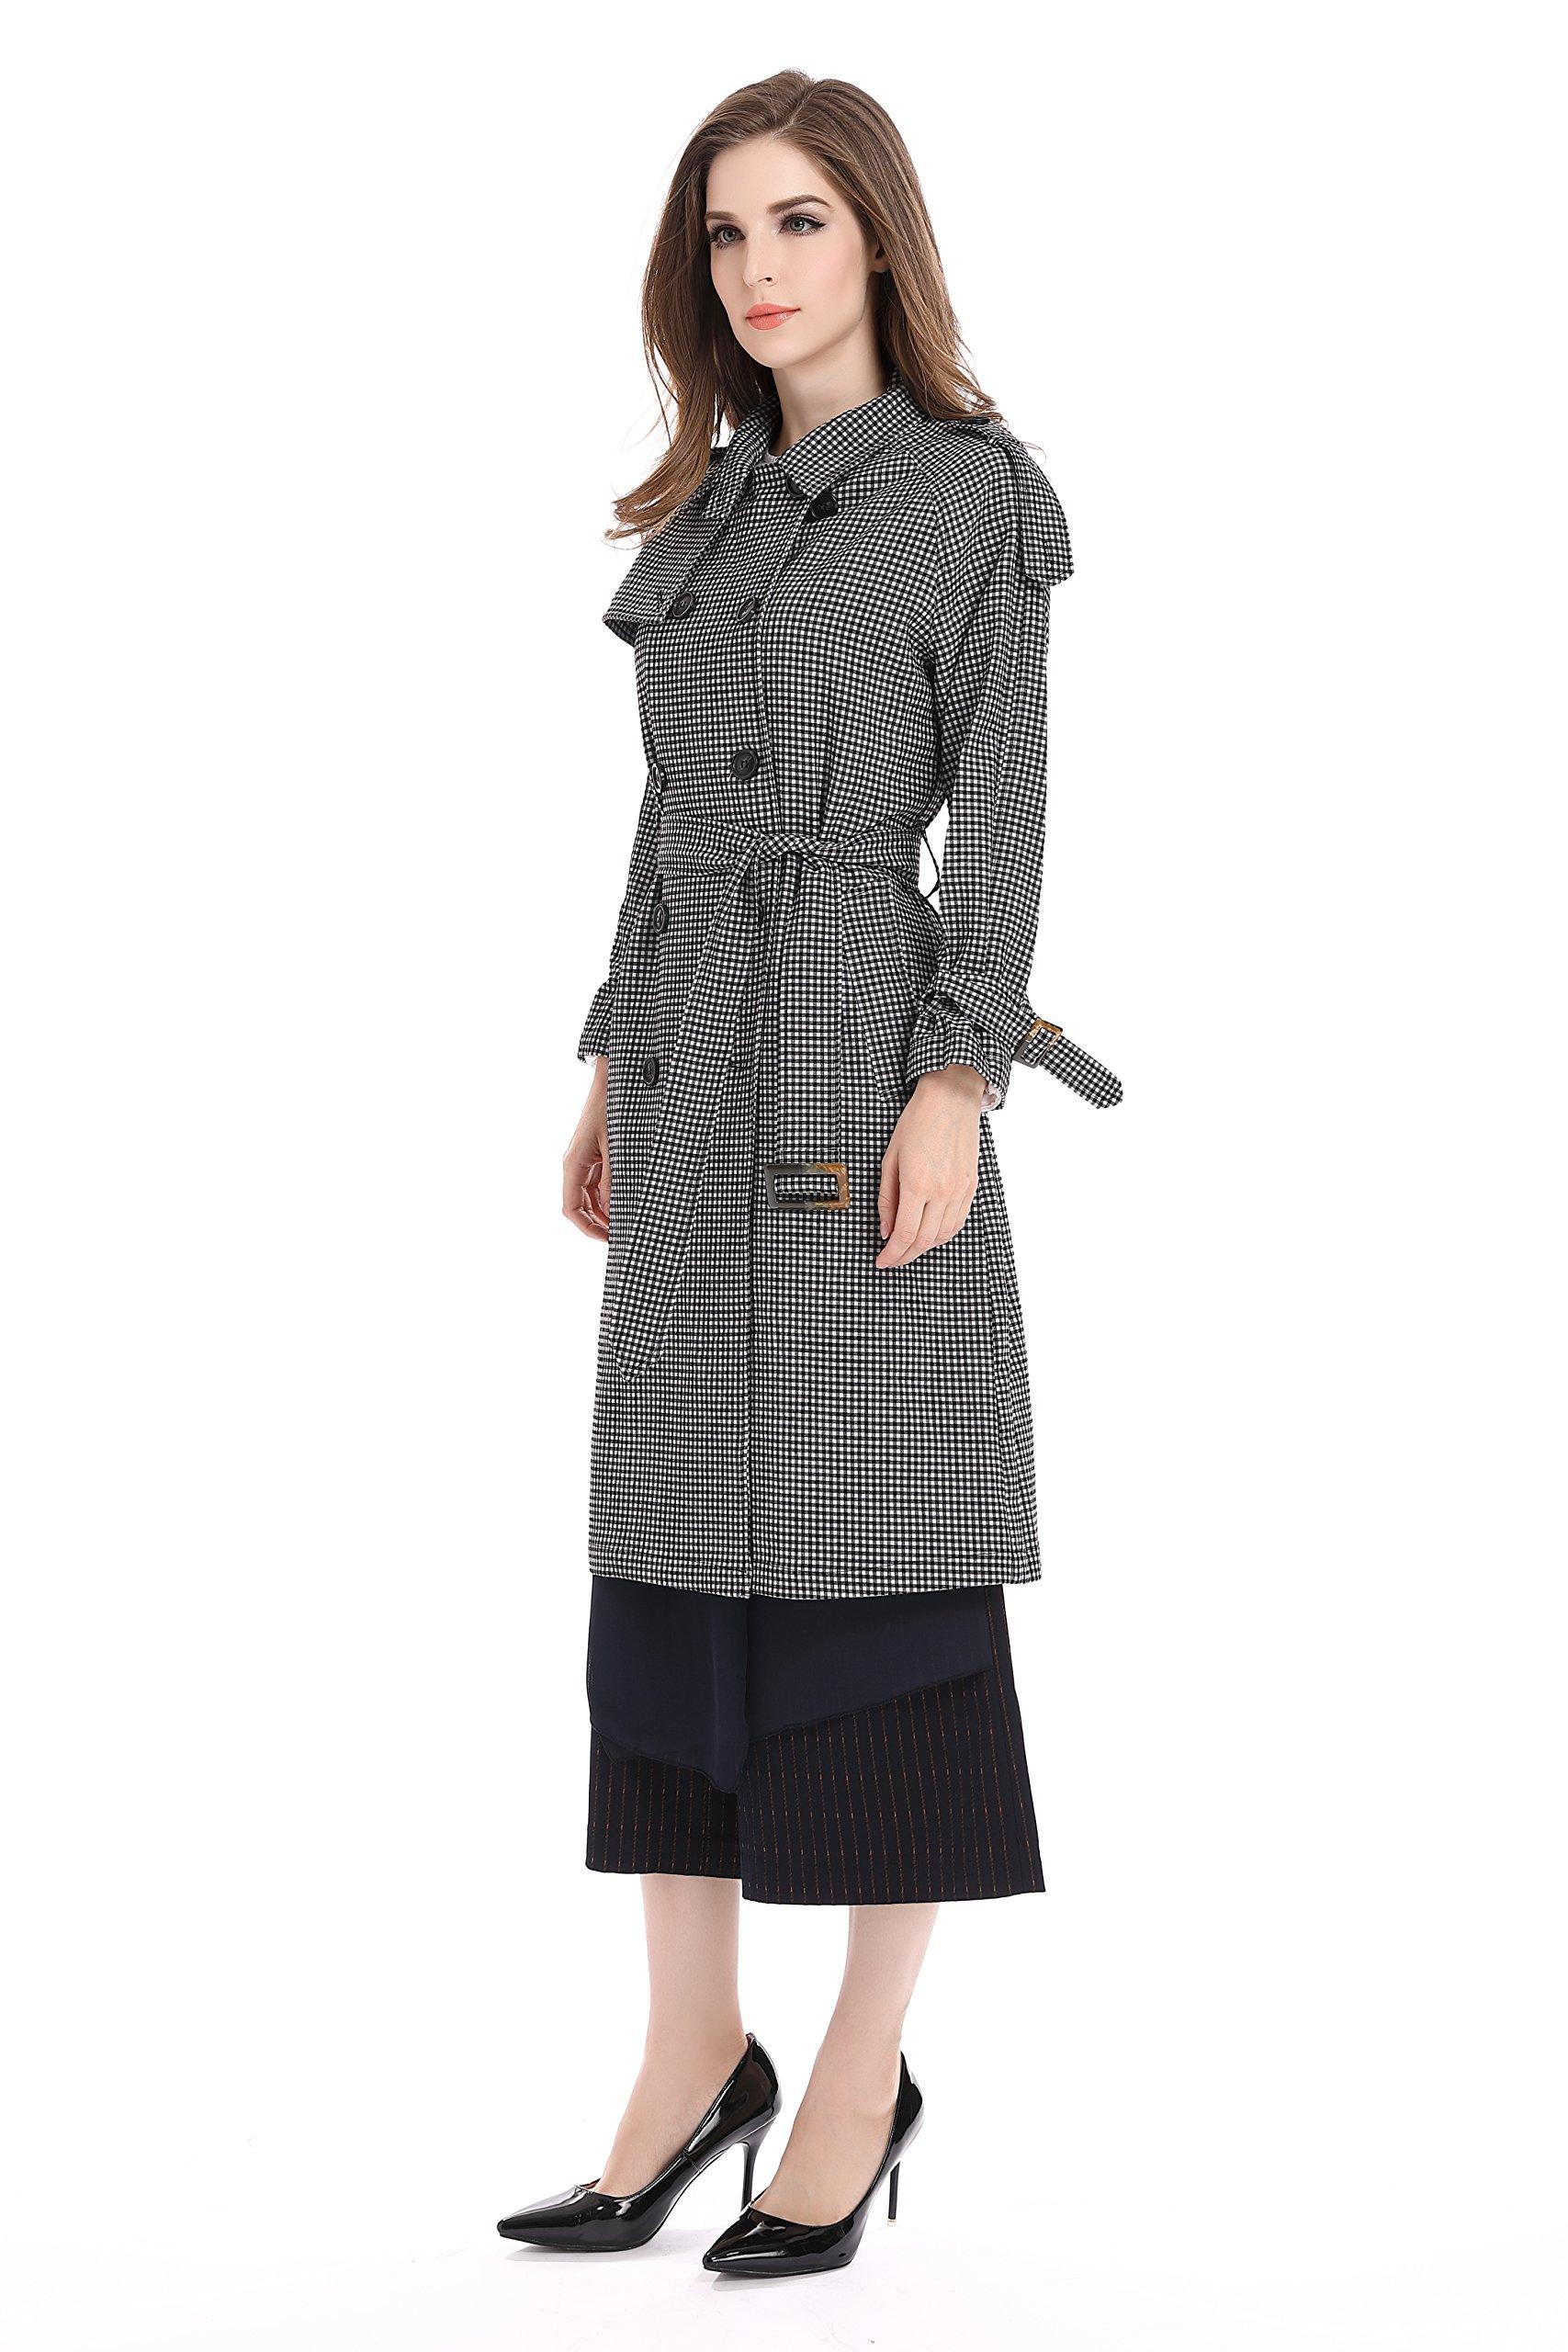 Bluemary Women's Fashion Fine Plaid Long Trench Coat With a Belt (medium, Greyish White) by Bluemary (Image #1)